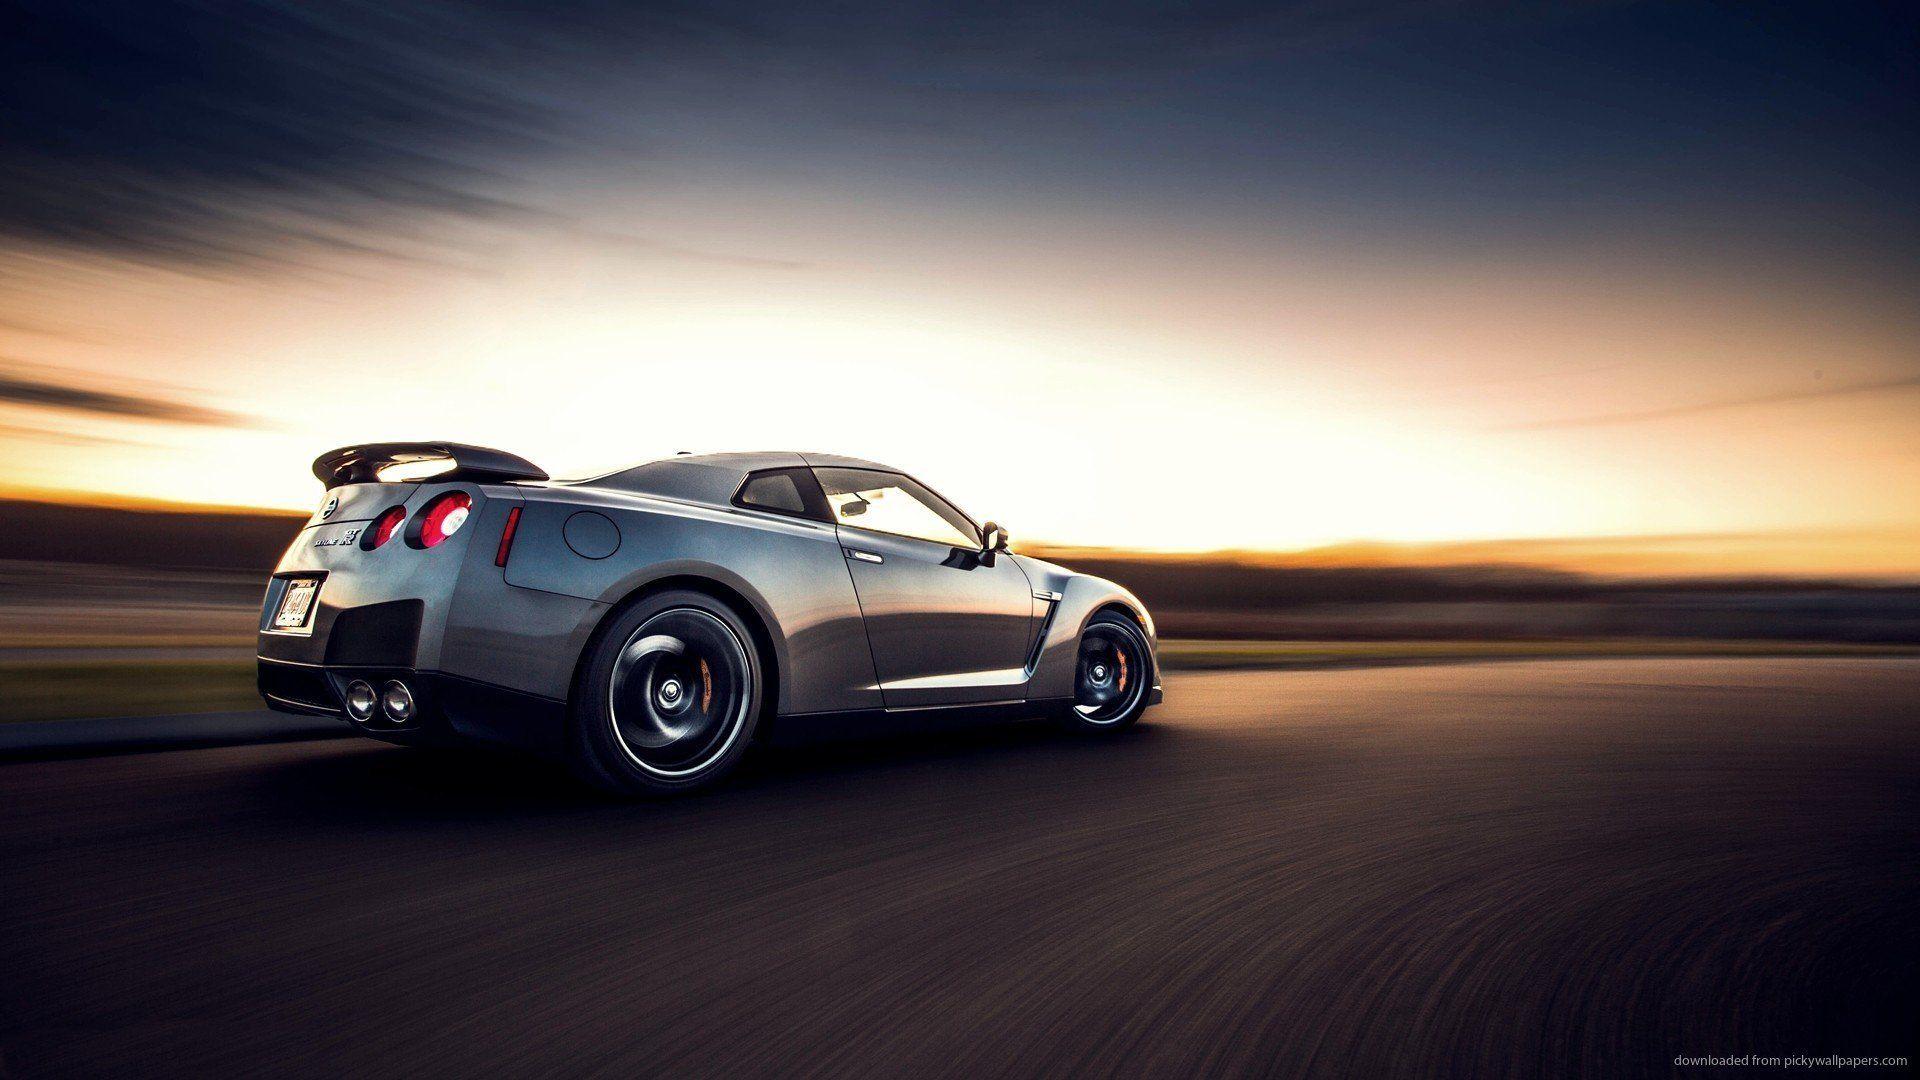 Nissan gtr motion blur desktop wallpaper picture